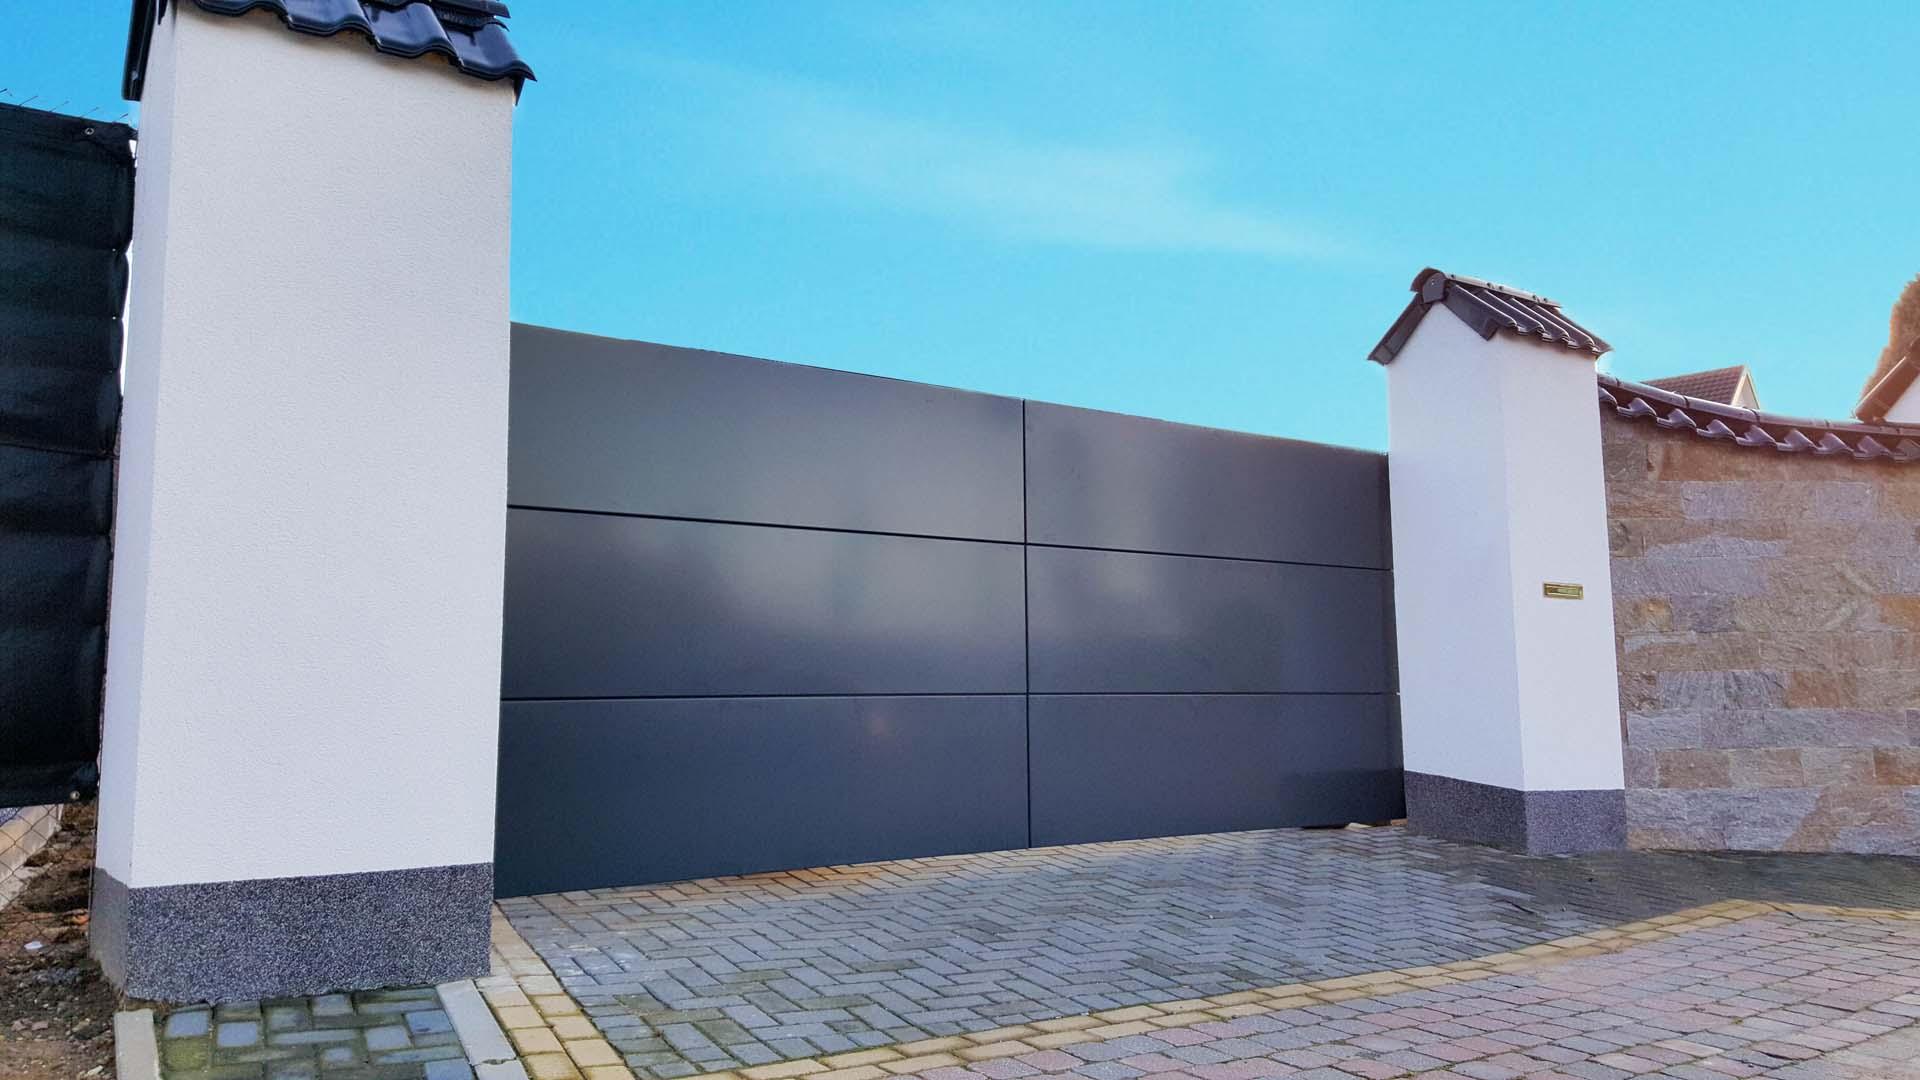 Moderne schuifpoort design aluminium horizontale panelen - Rekem, Limburg